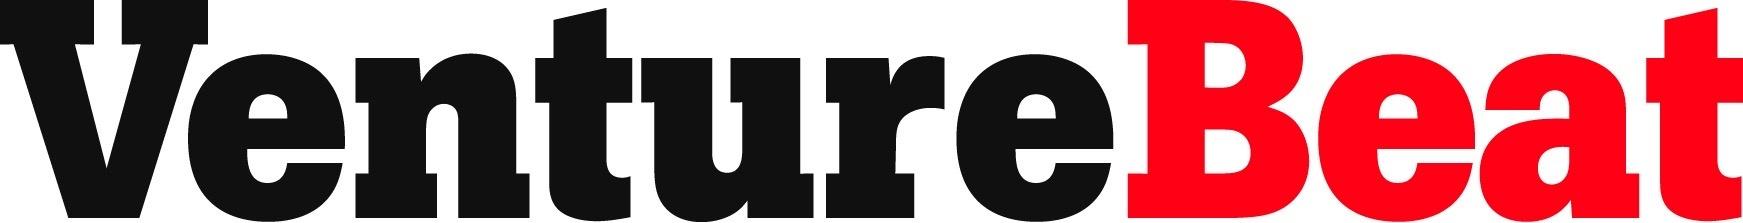 VentureBeat-logo